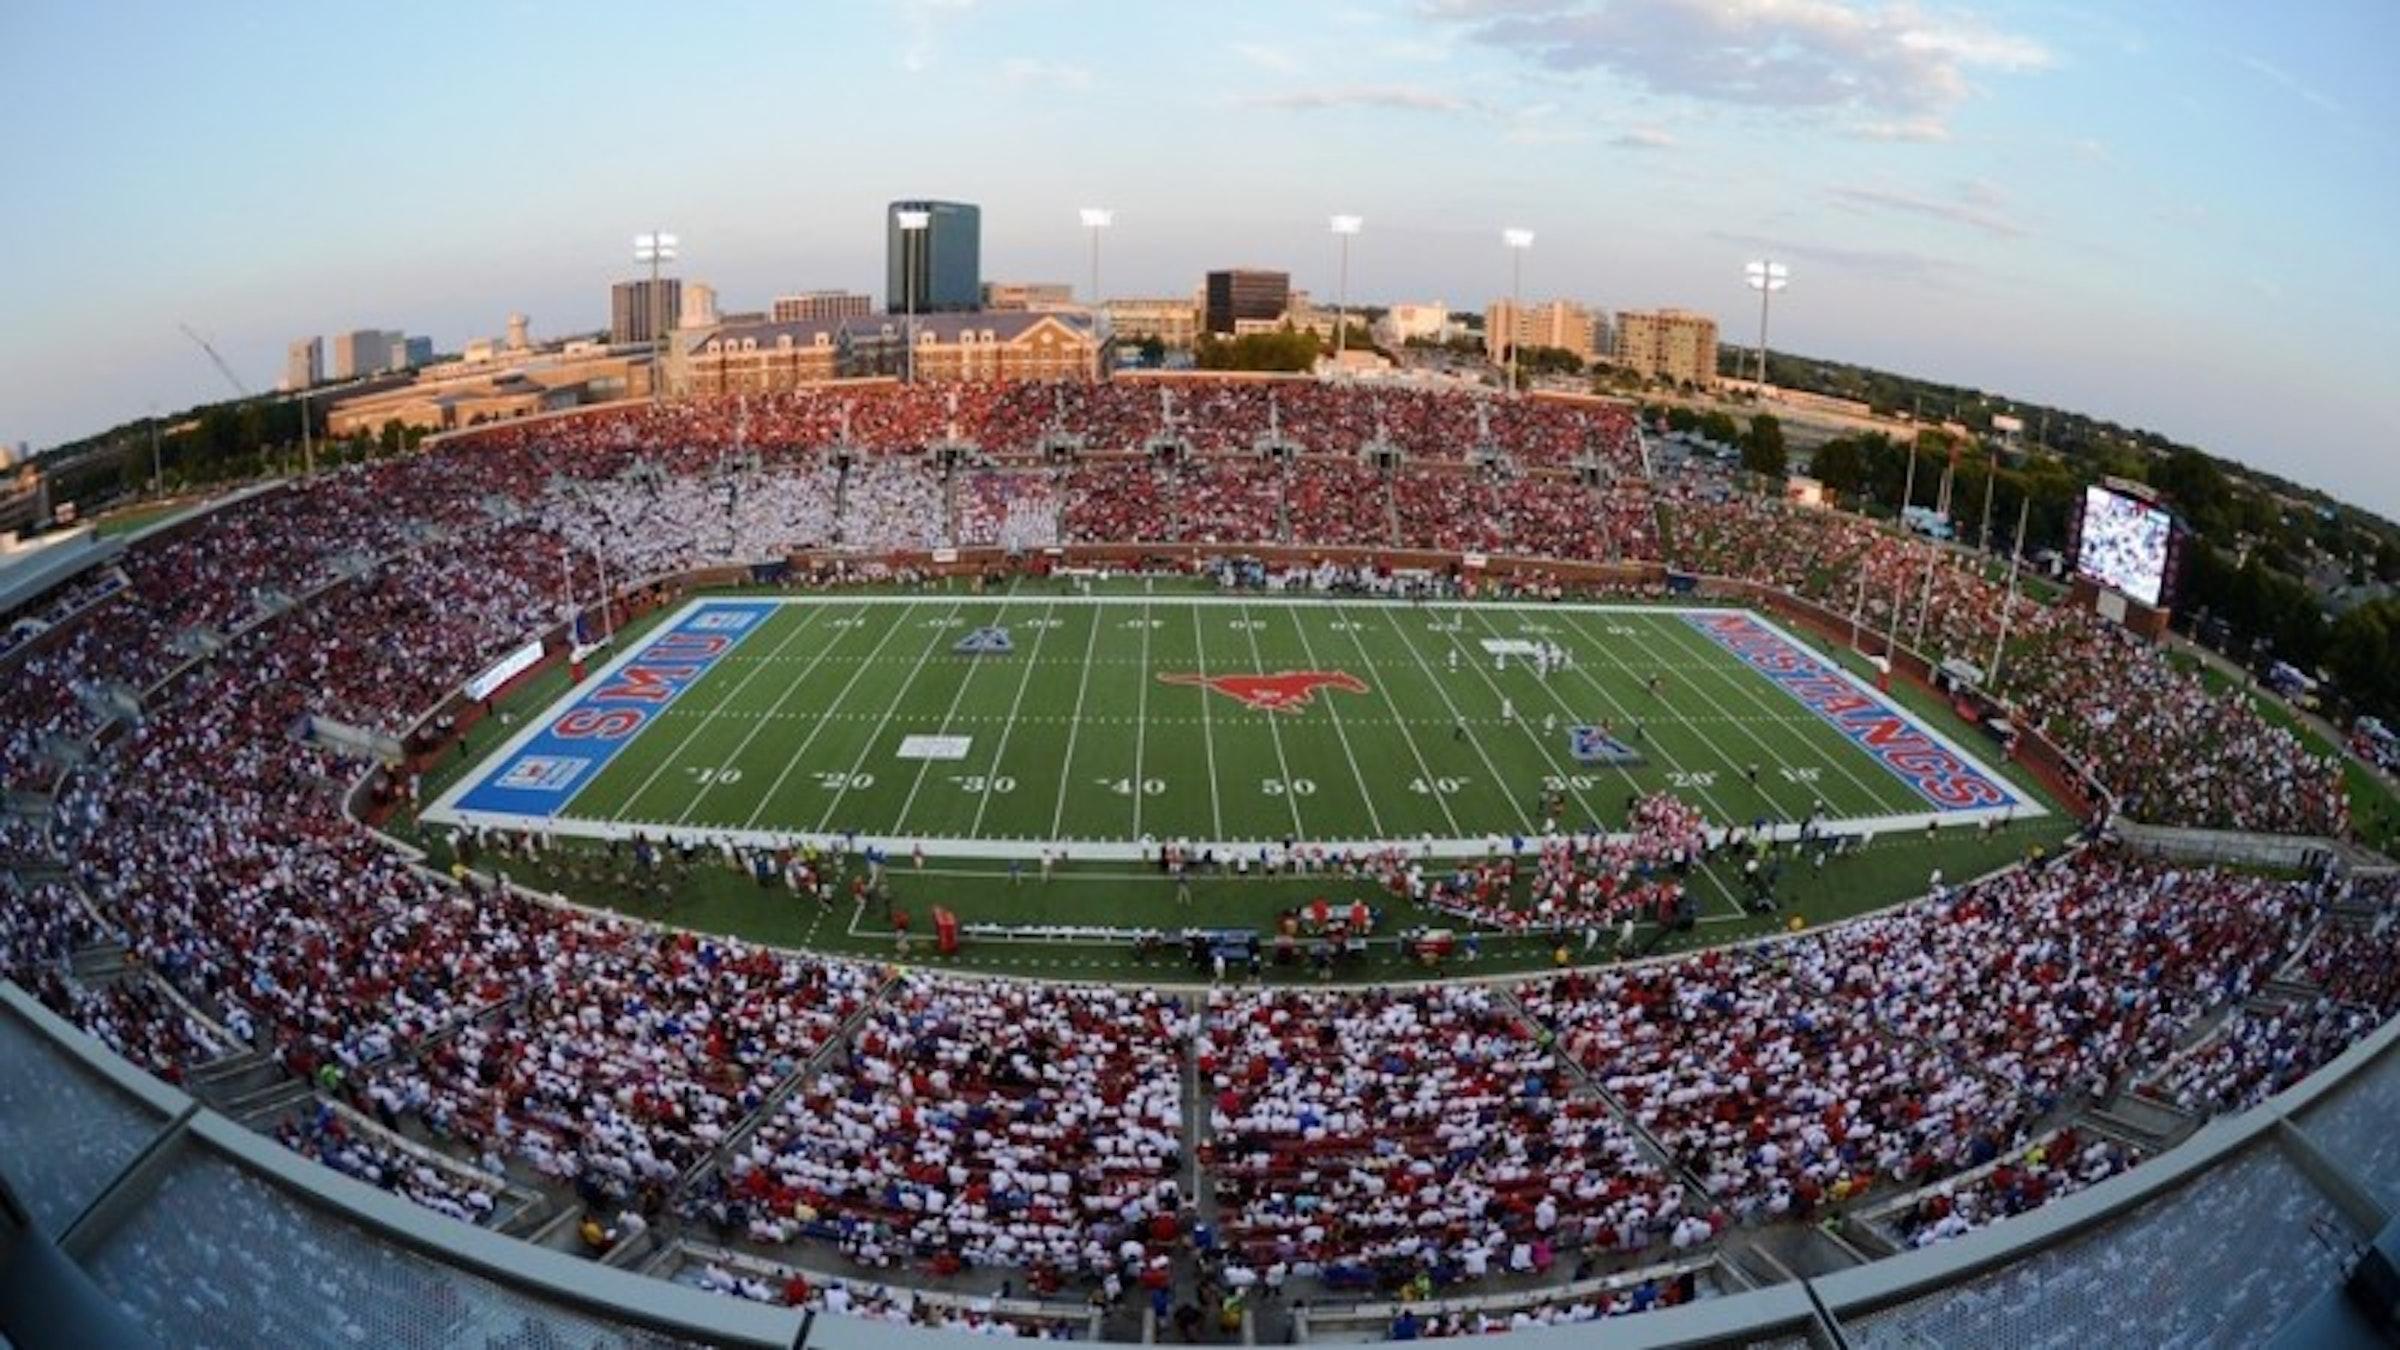 SMU - Gerald J. Ford Stadium